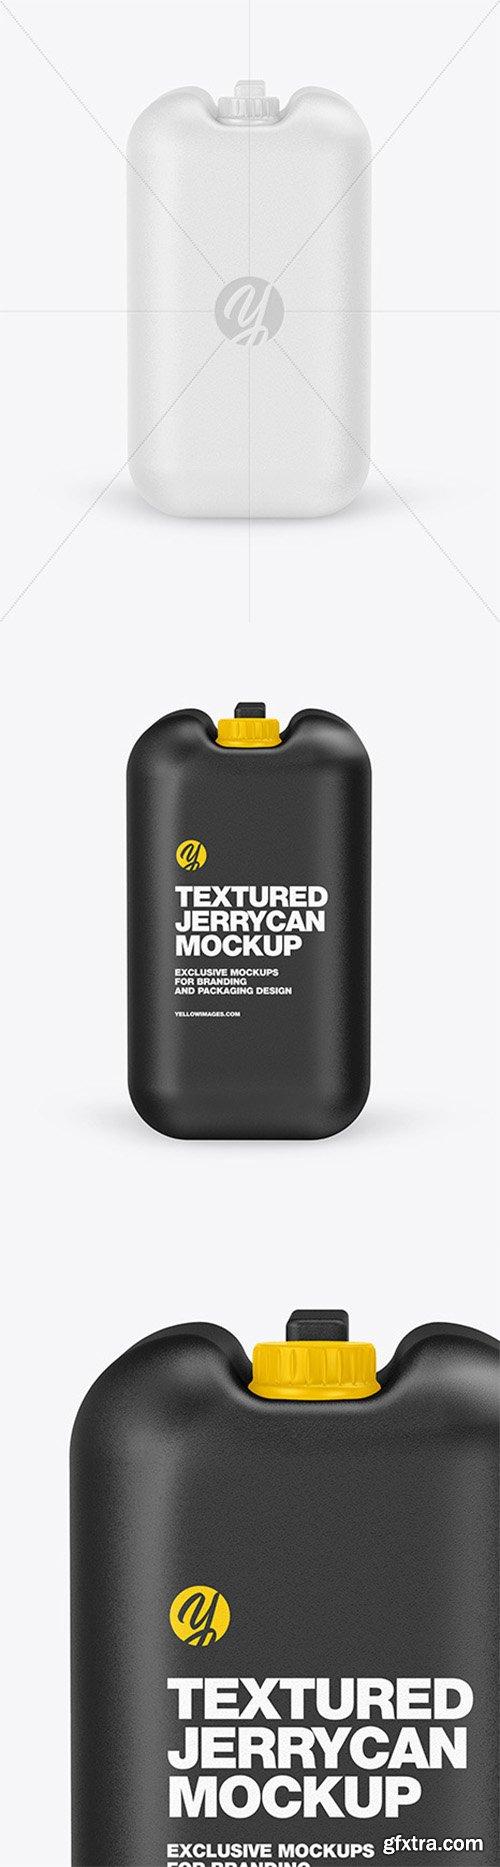 Textured Jerrycan Mockup 79910